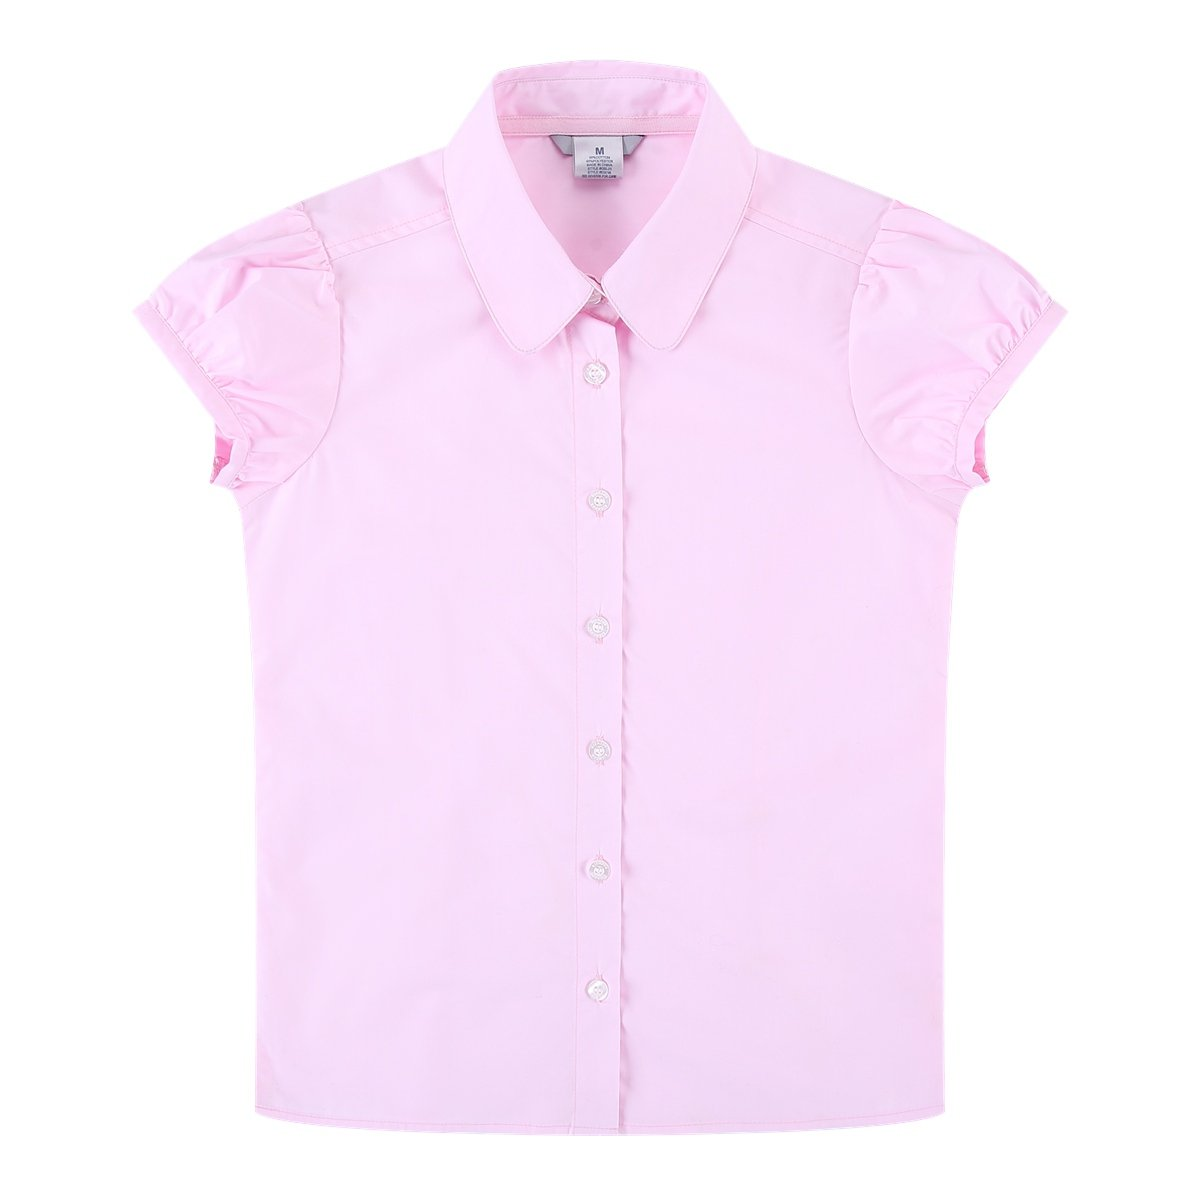 Bienzoe - Camicia - ragazza Bienzoe - Camicia - ragazza 160016EU